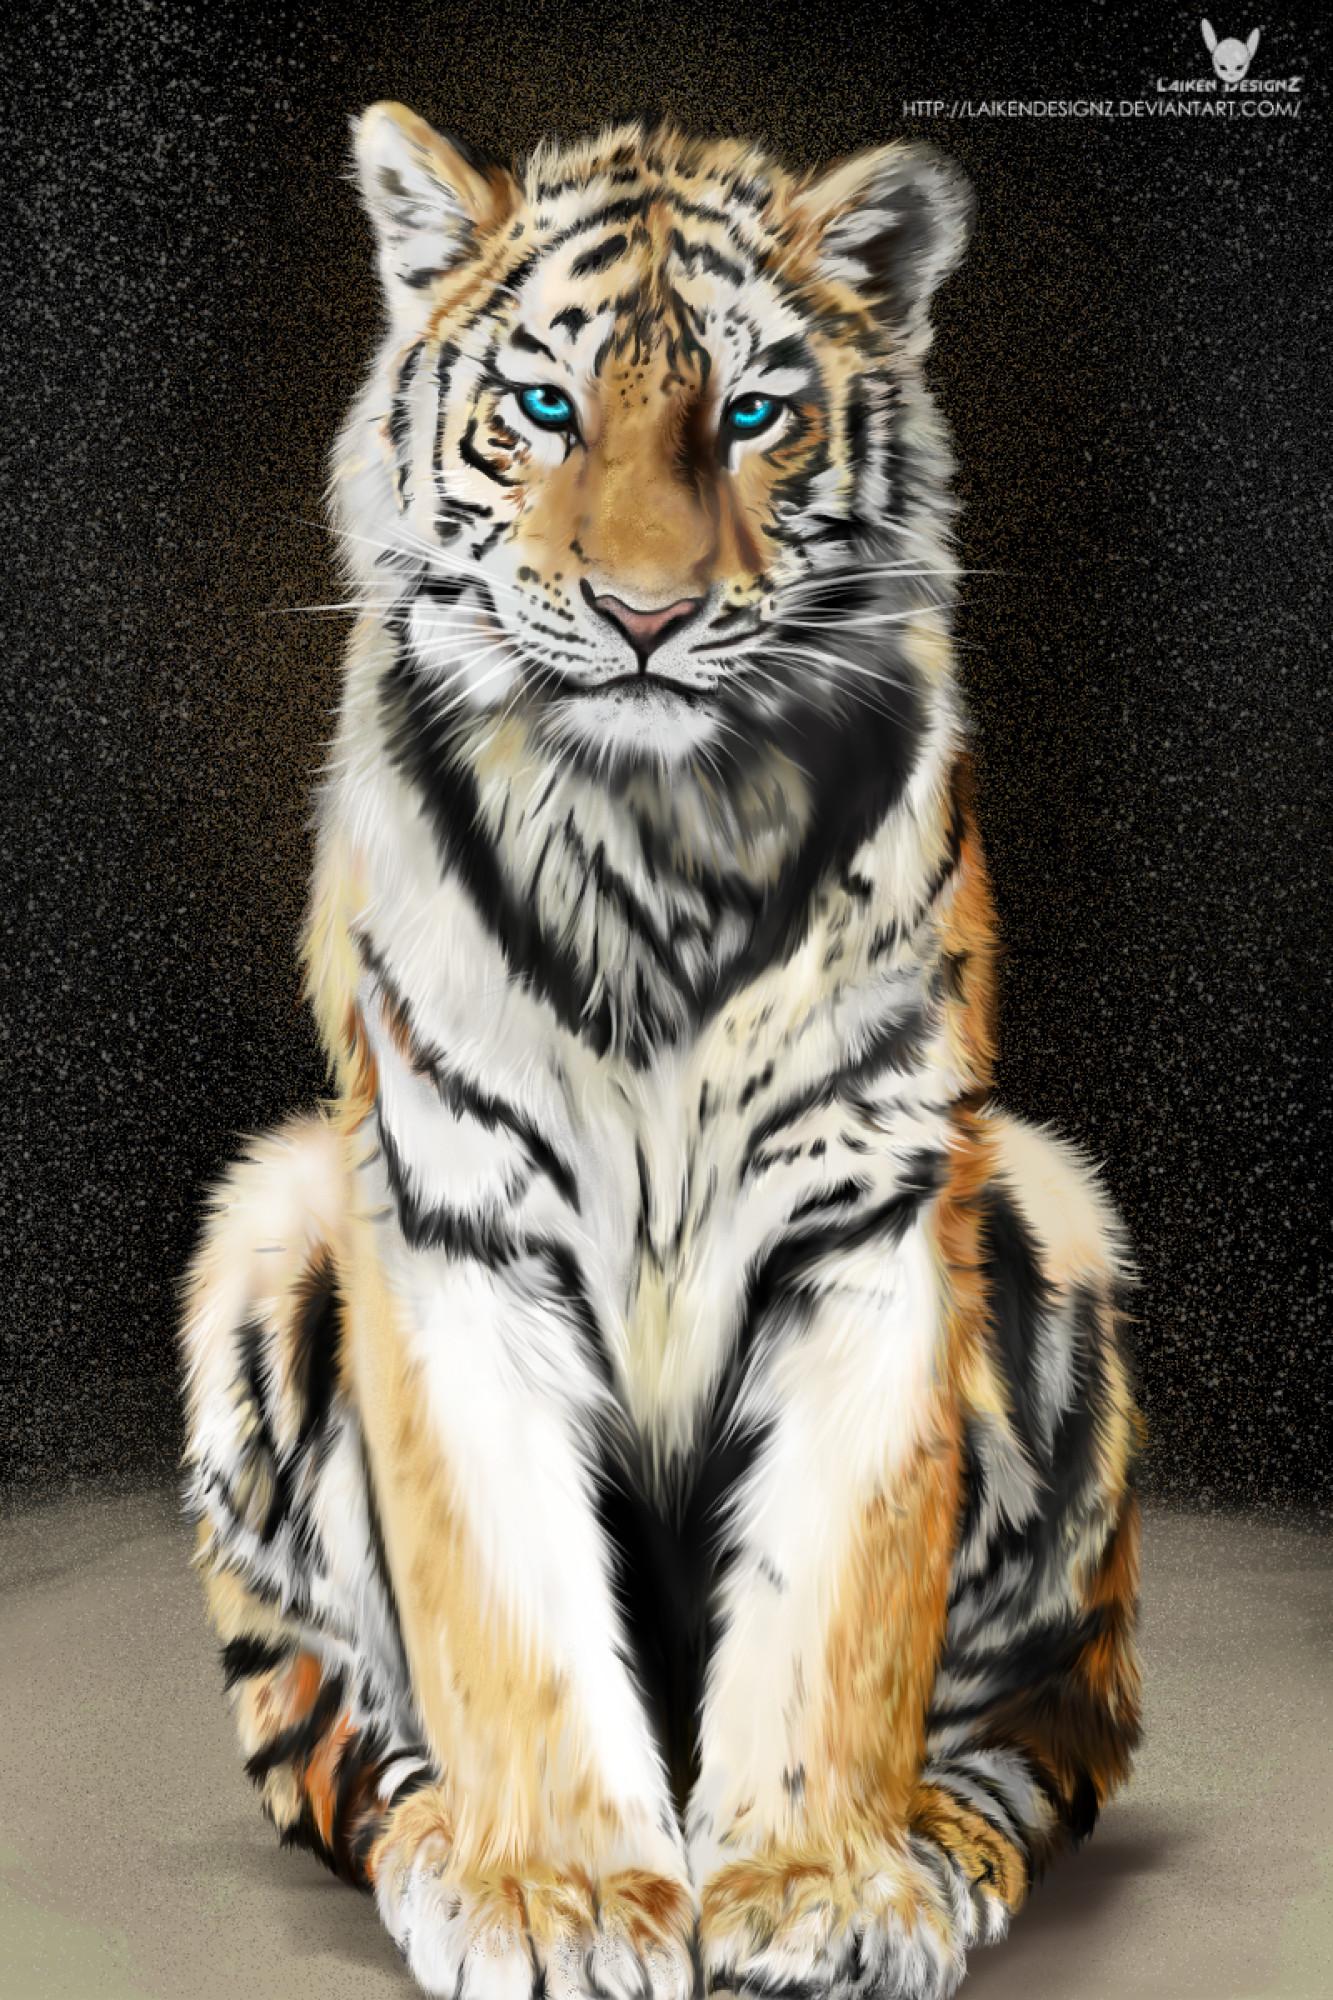 artstation - tiger art, laiken designz